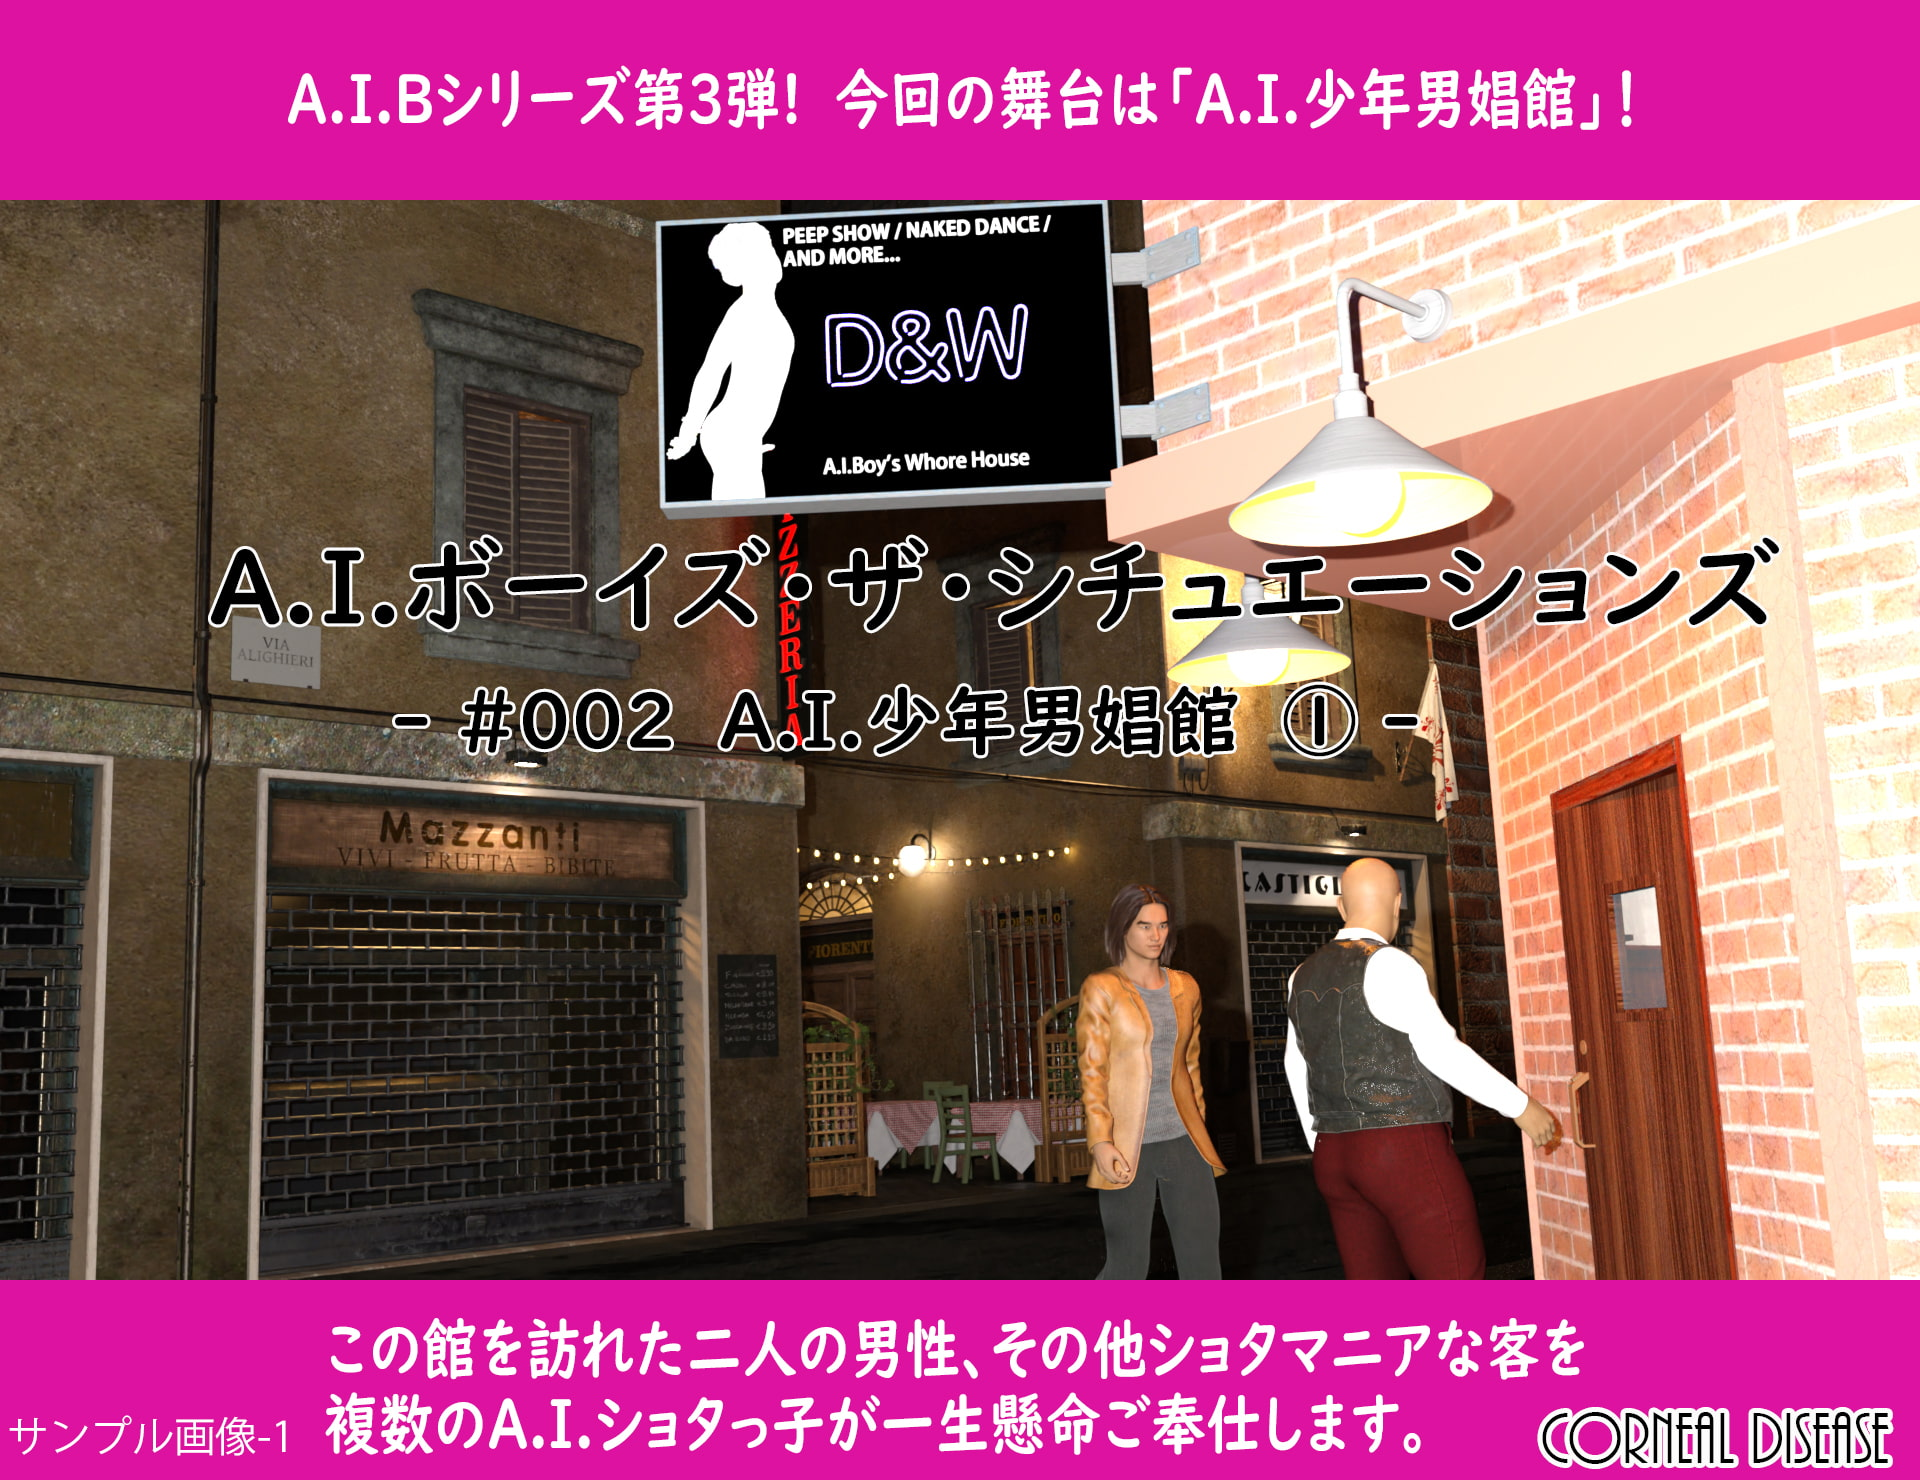 A.I.ボーイズ・ザ・シチュエーションズ -#002 A.I.少年男娼館(1)-